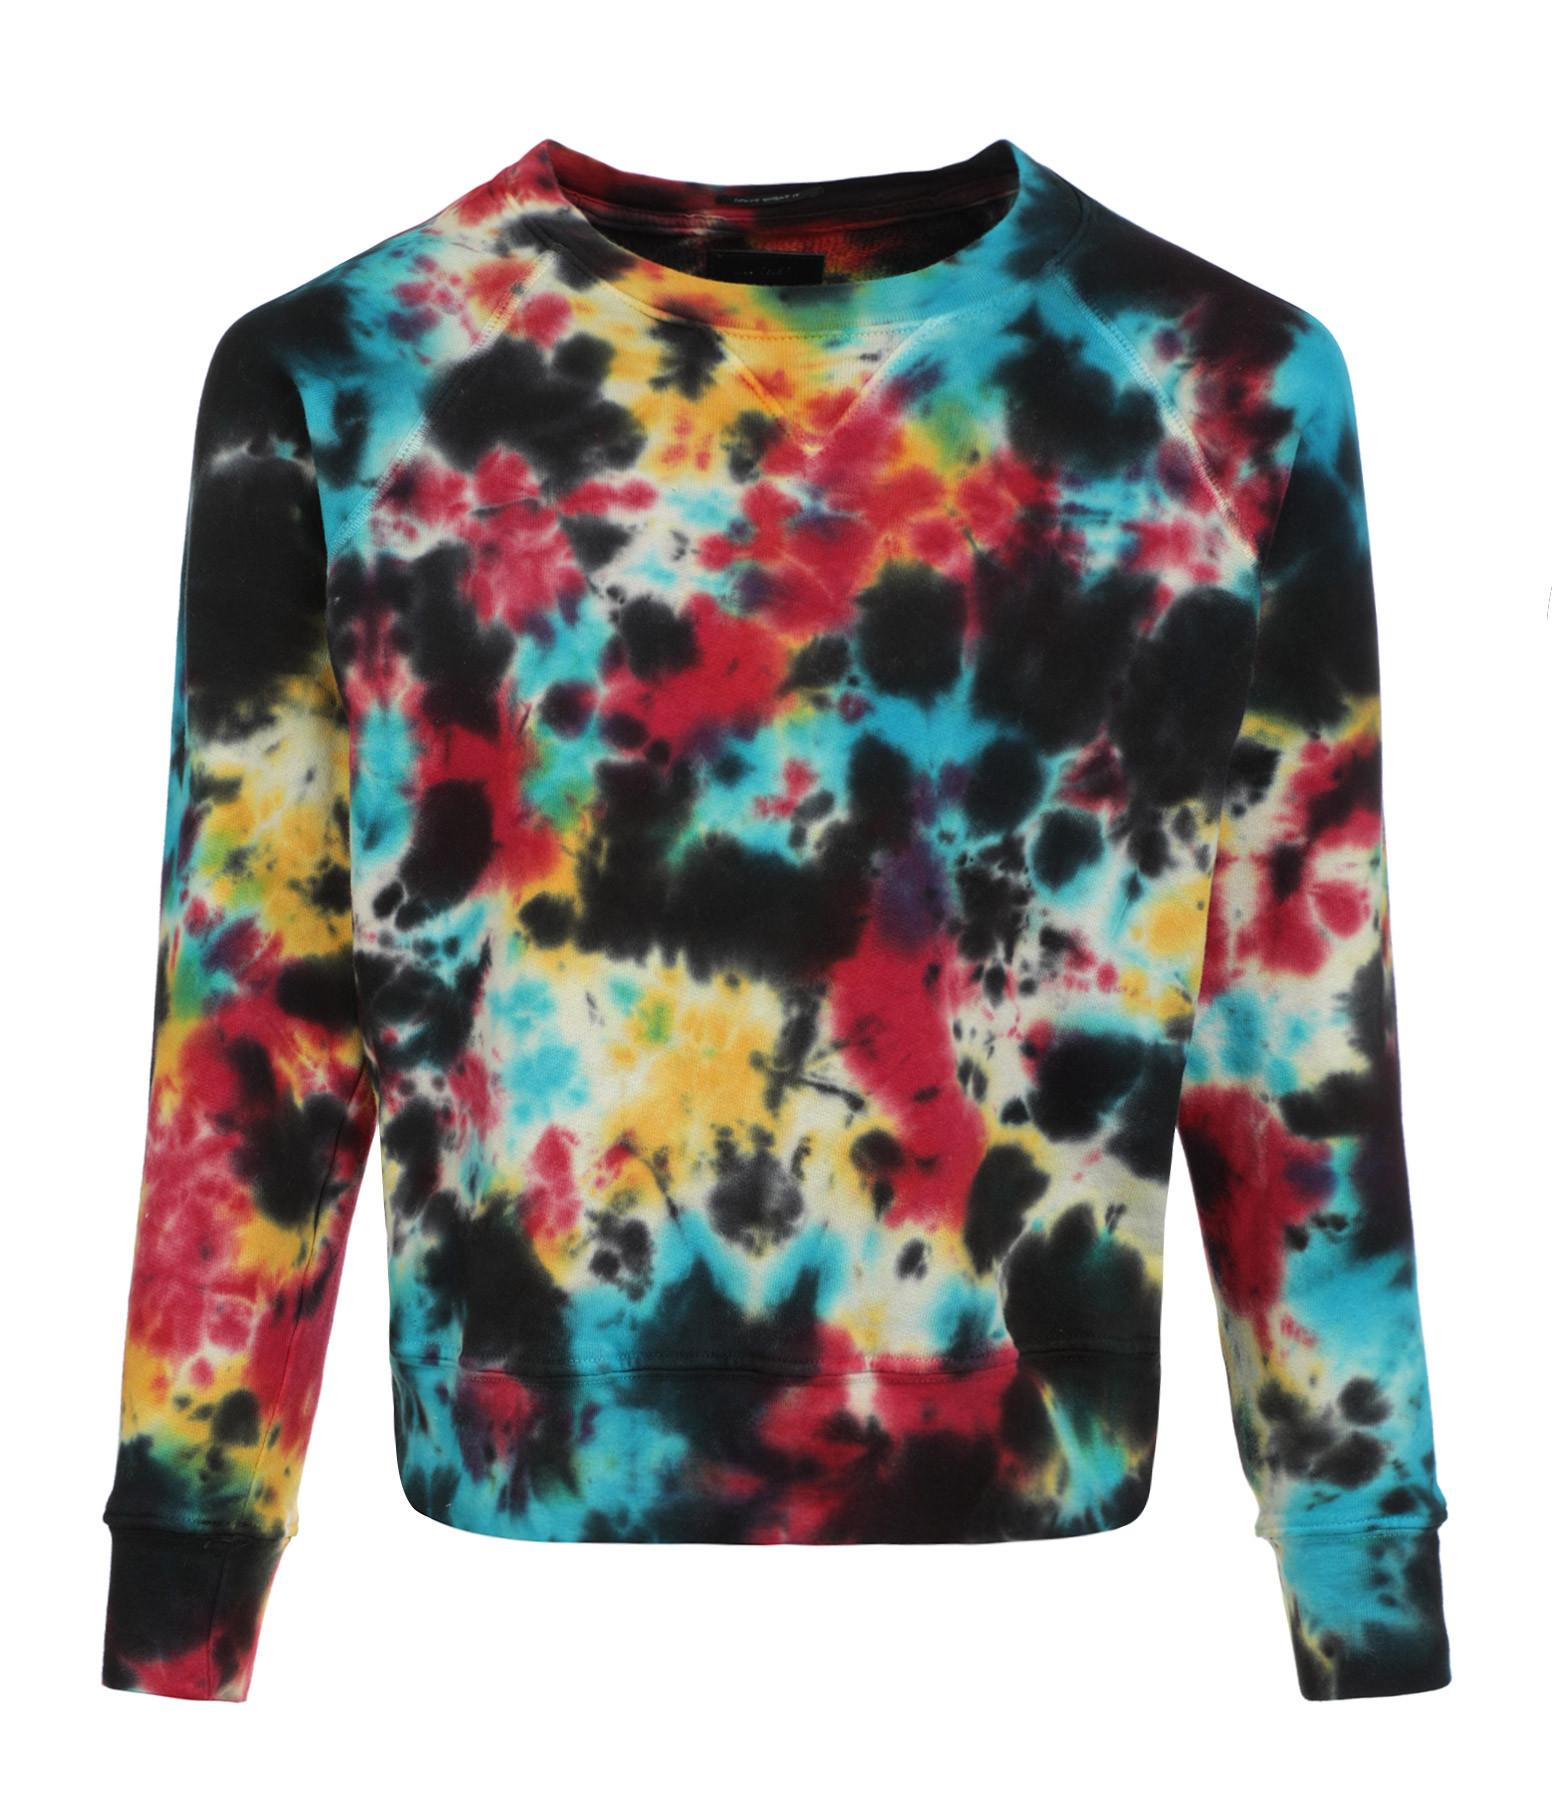 MOTHER - Sweatshirt The Square Coton Vertigo